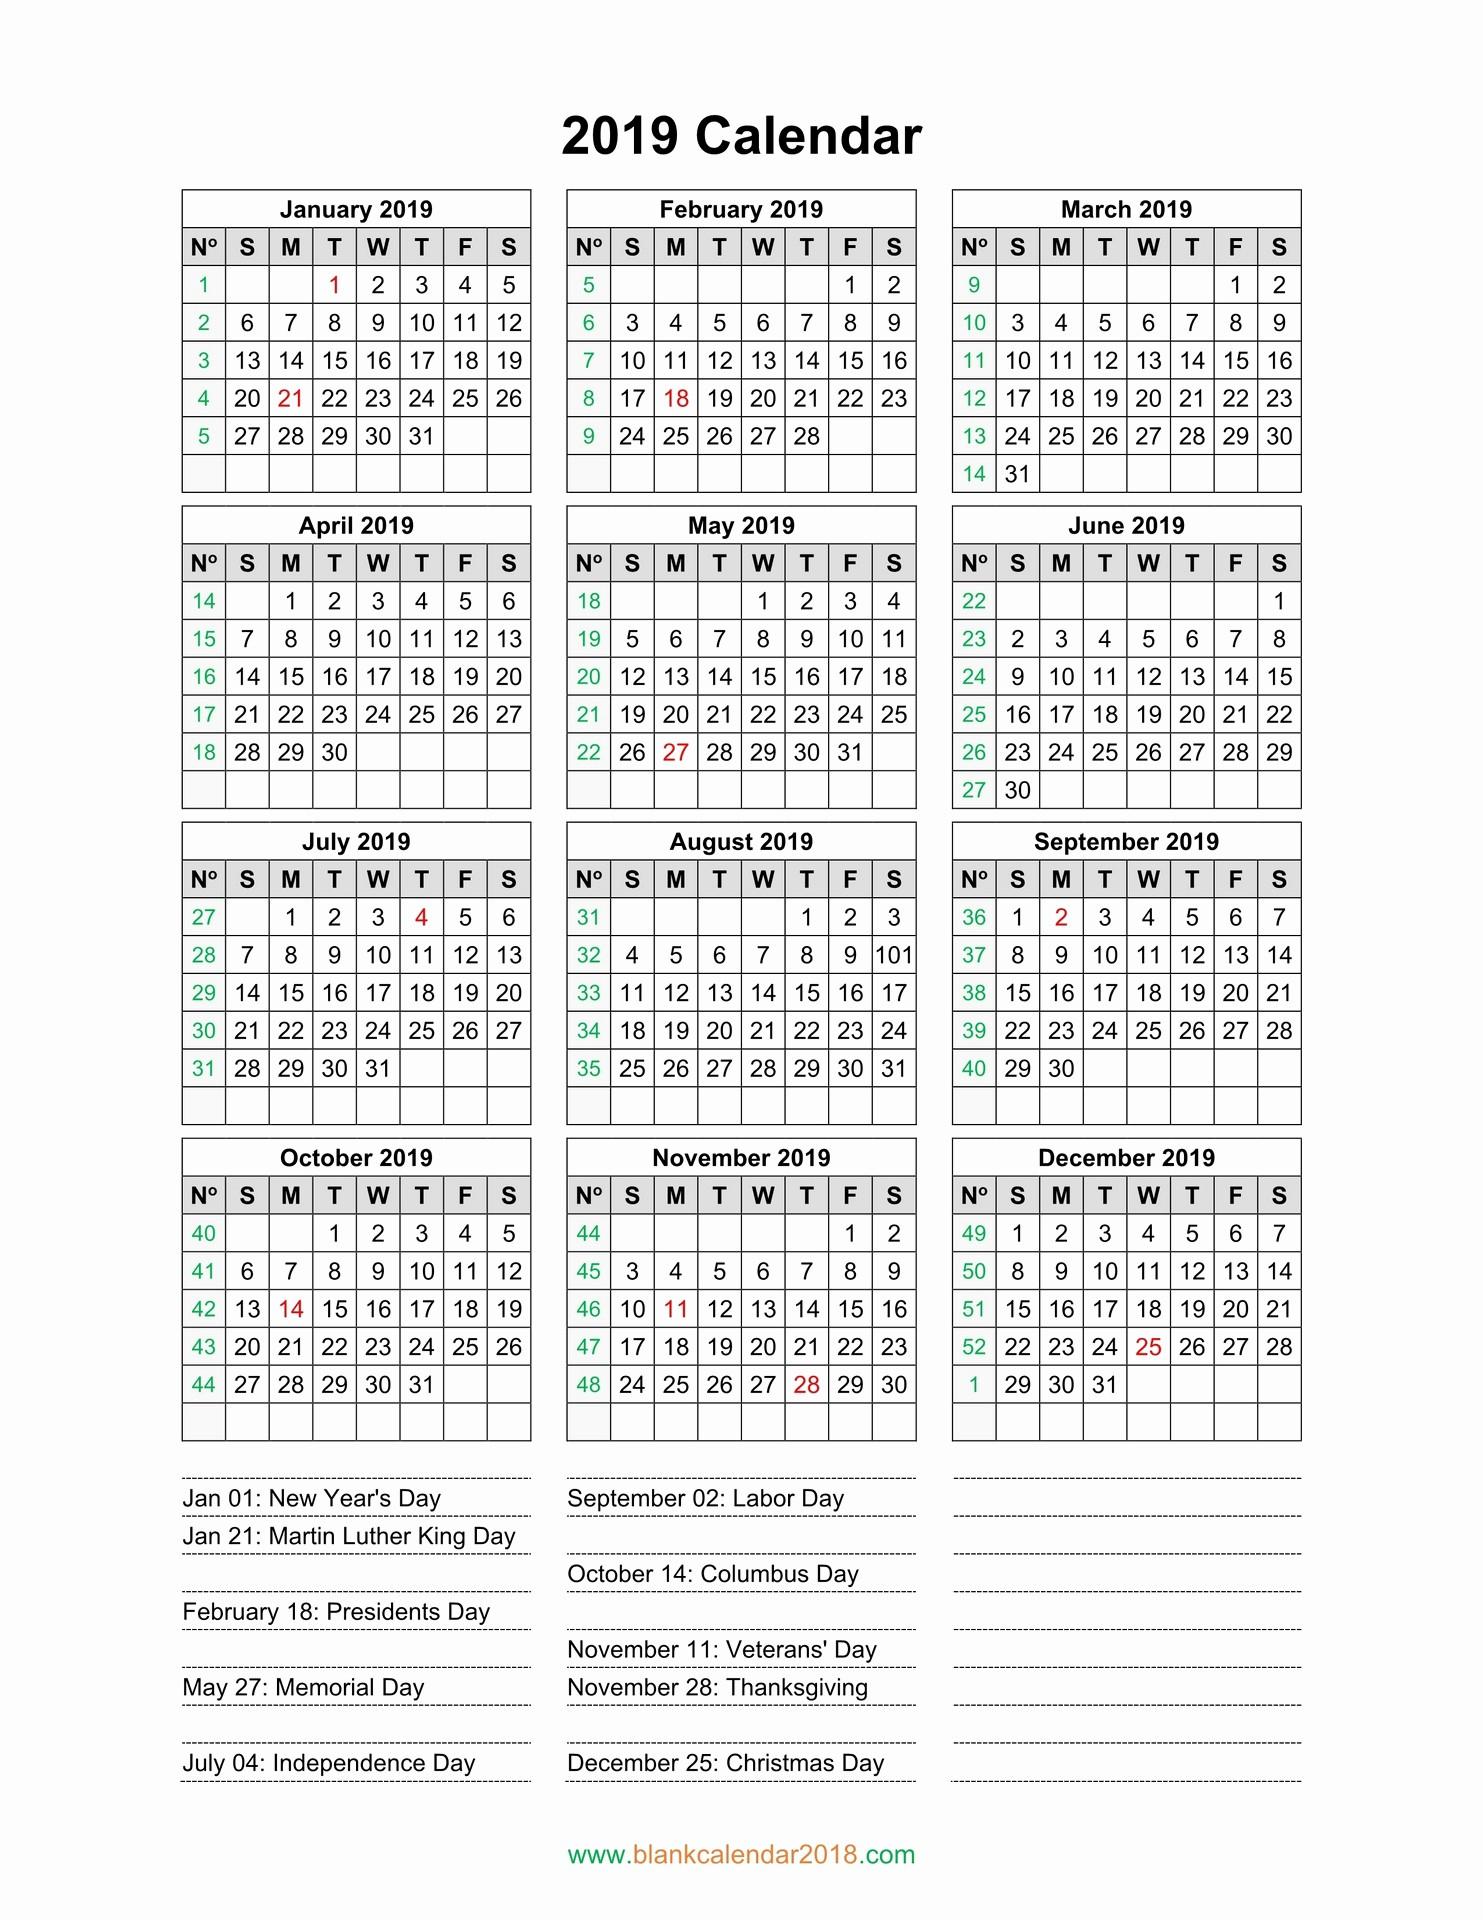 2019 Yearly Calendar with Holidays Luxury Blank Calendar 2019